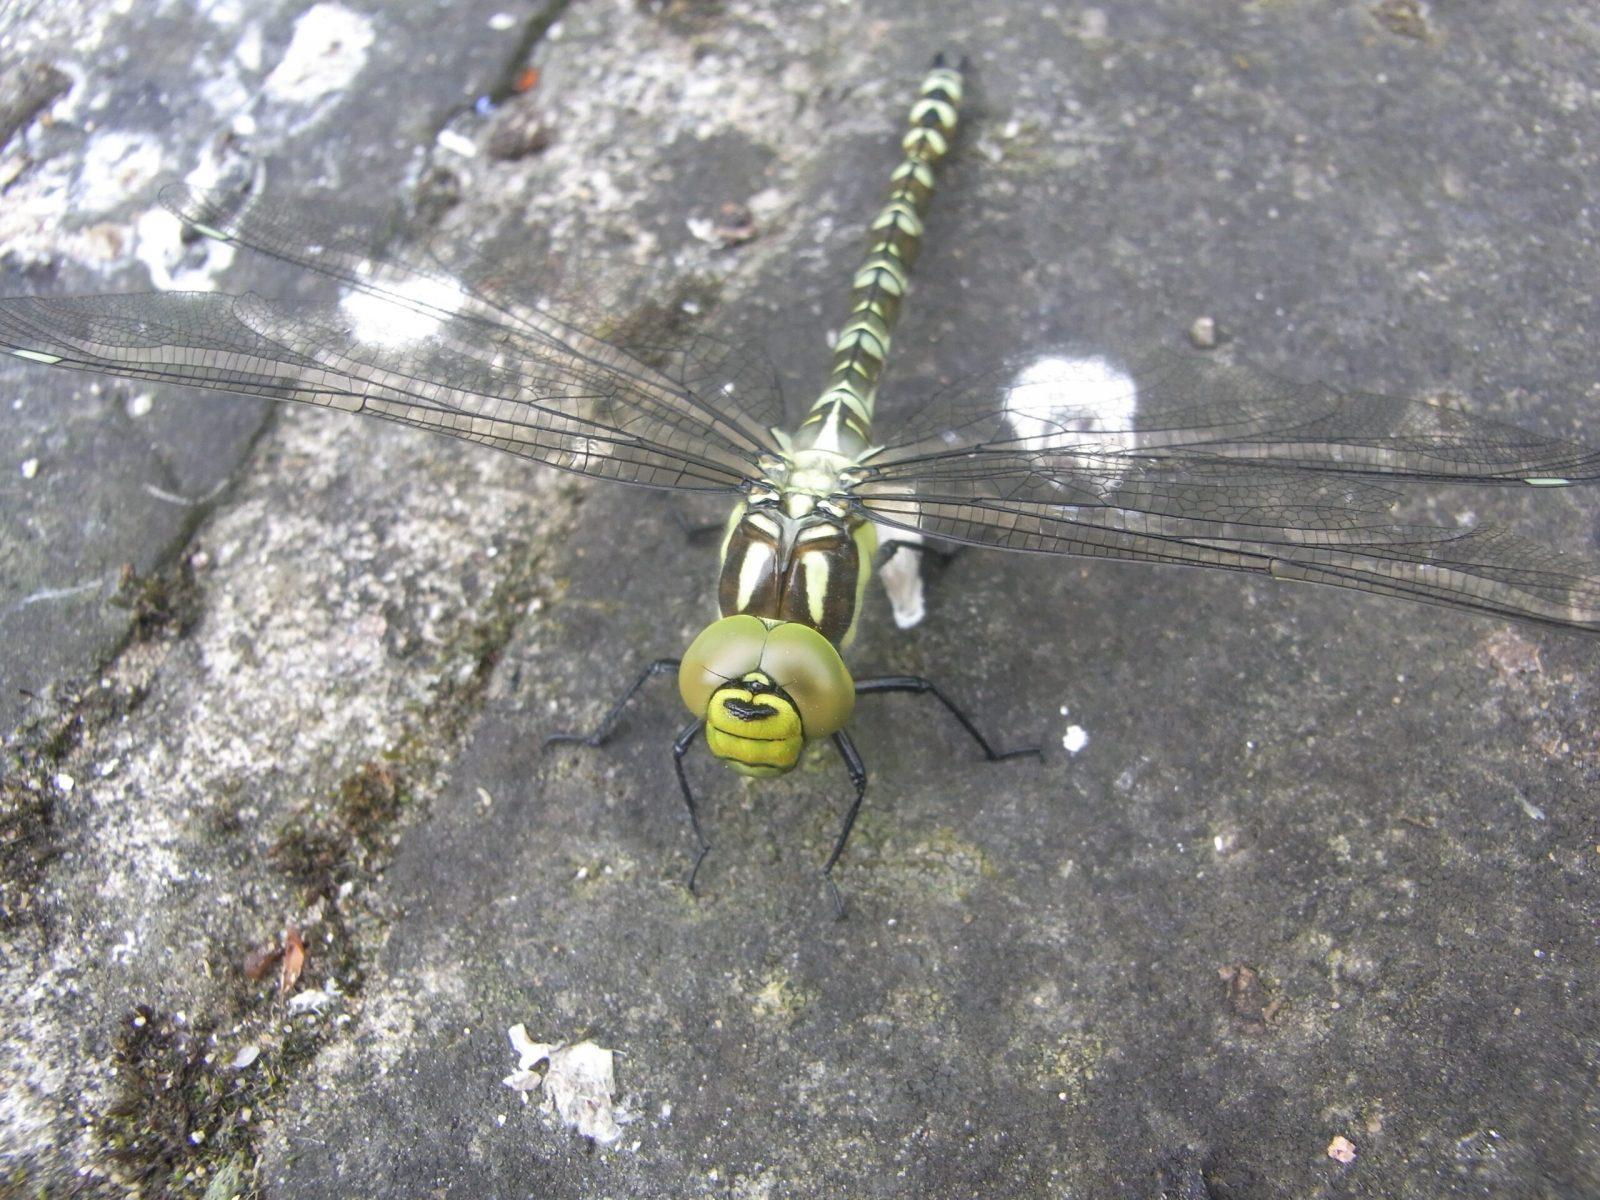 Southern Hawker - Aeshna cyanea (female), Finningley.